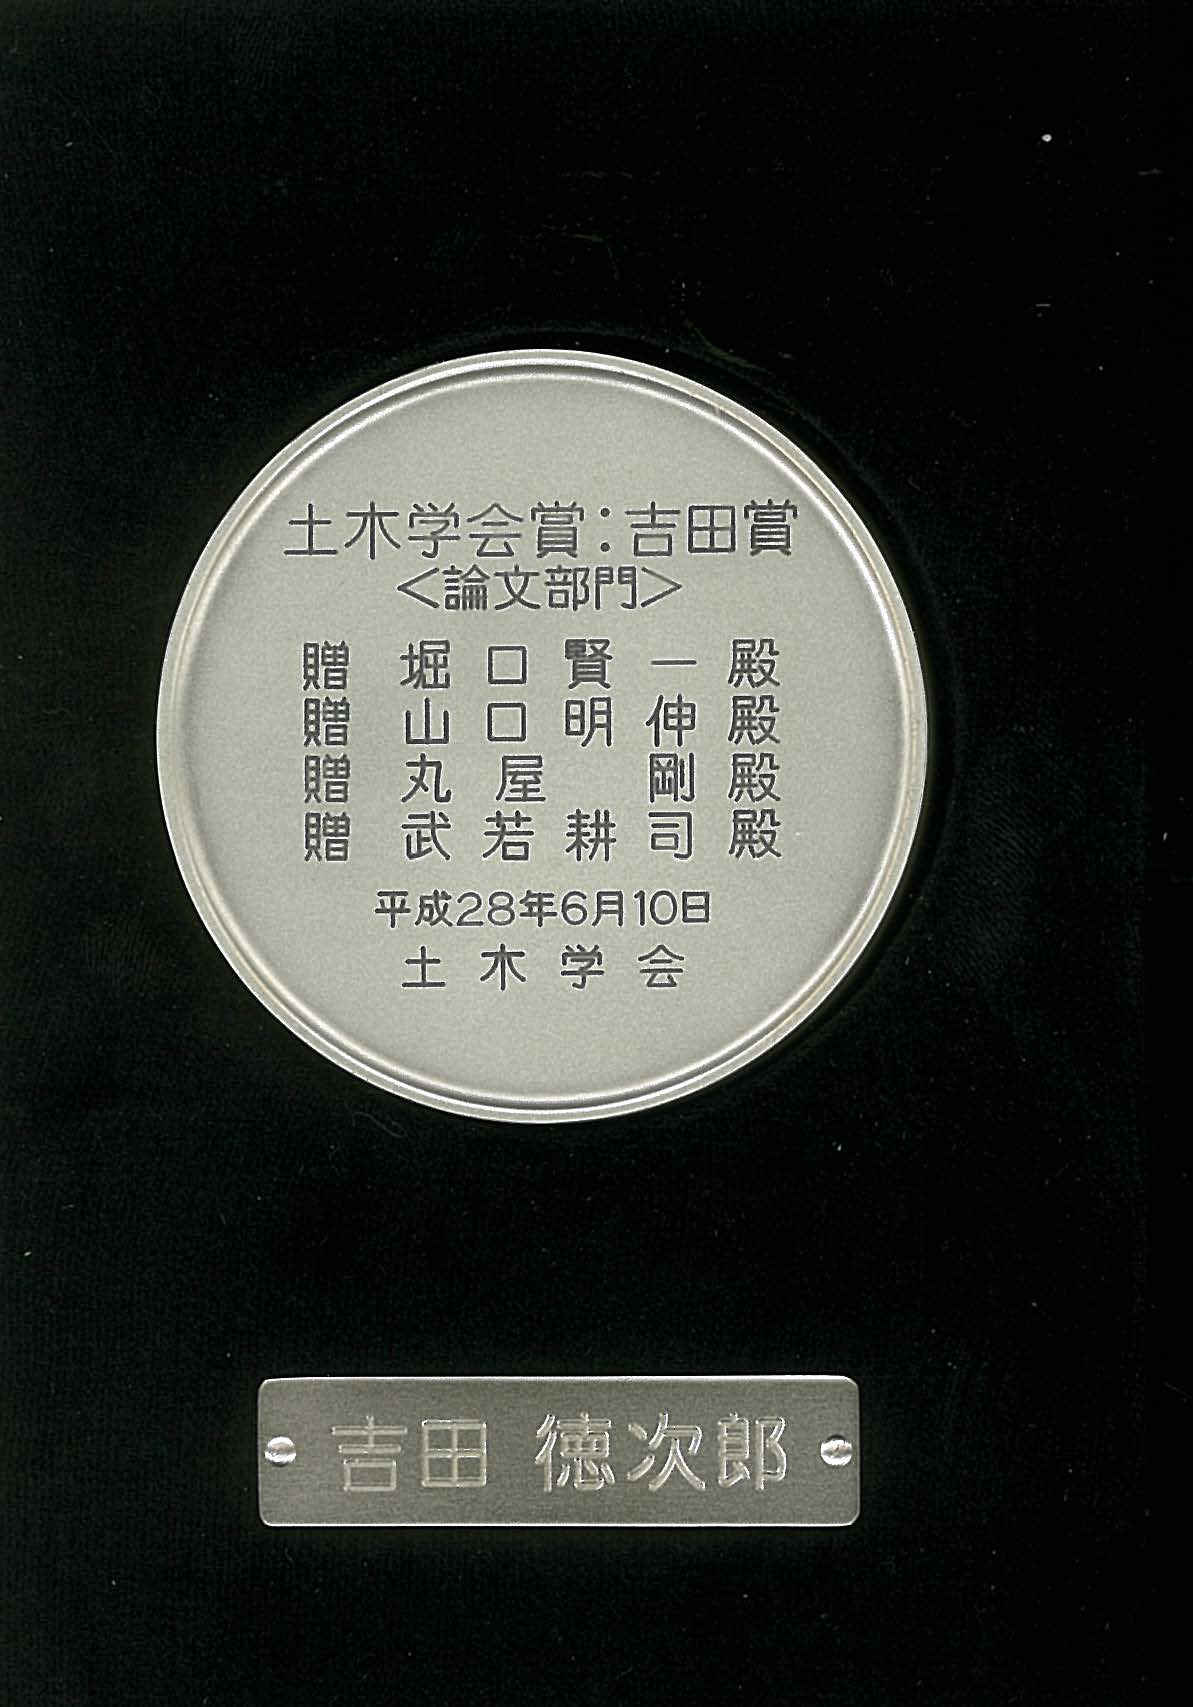 土木学会_メダル画像・裏